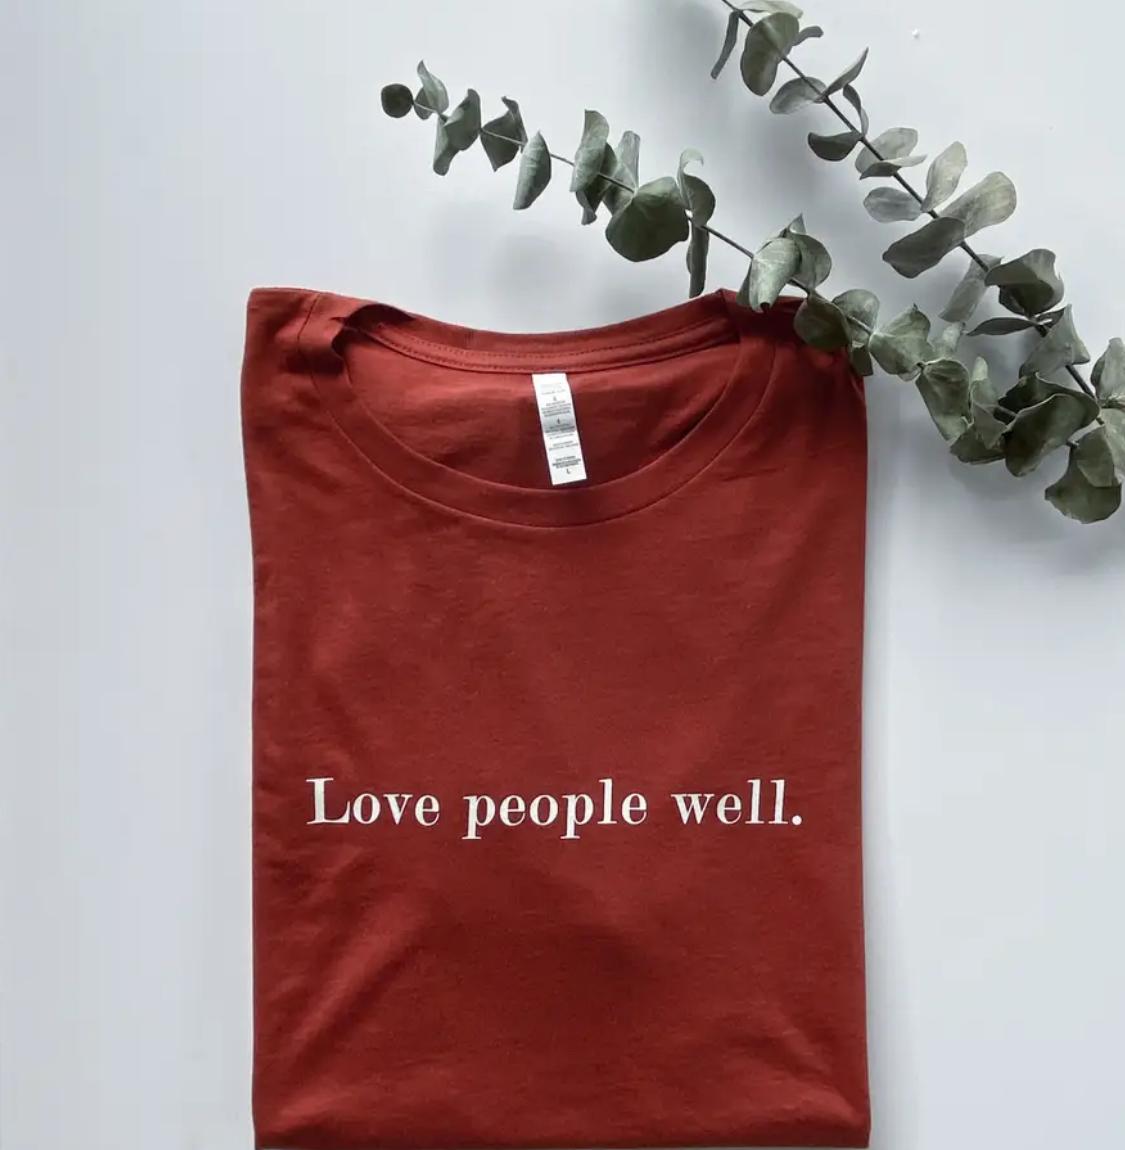 Know Purpose Love People Well Tee